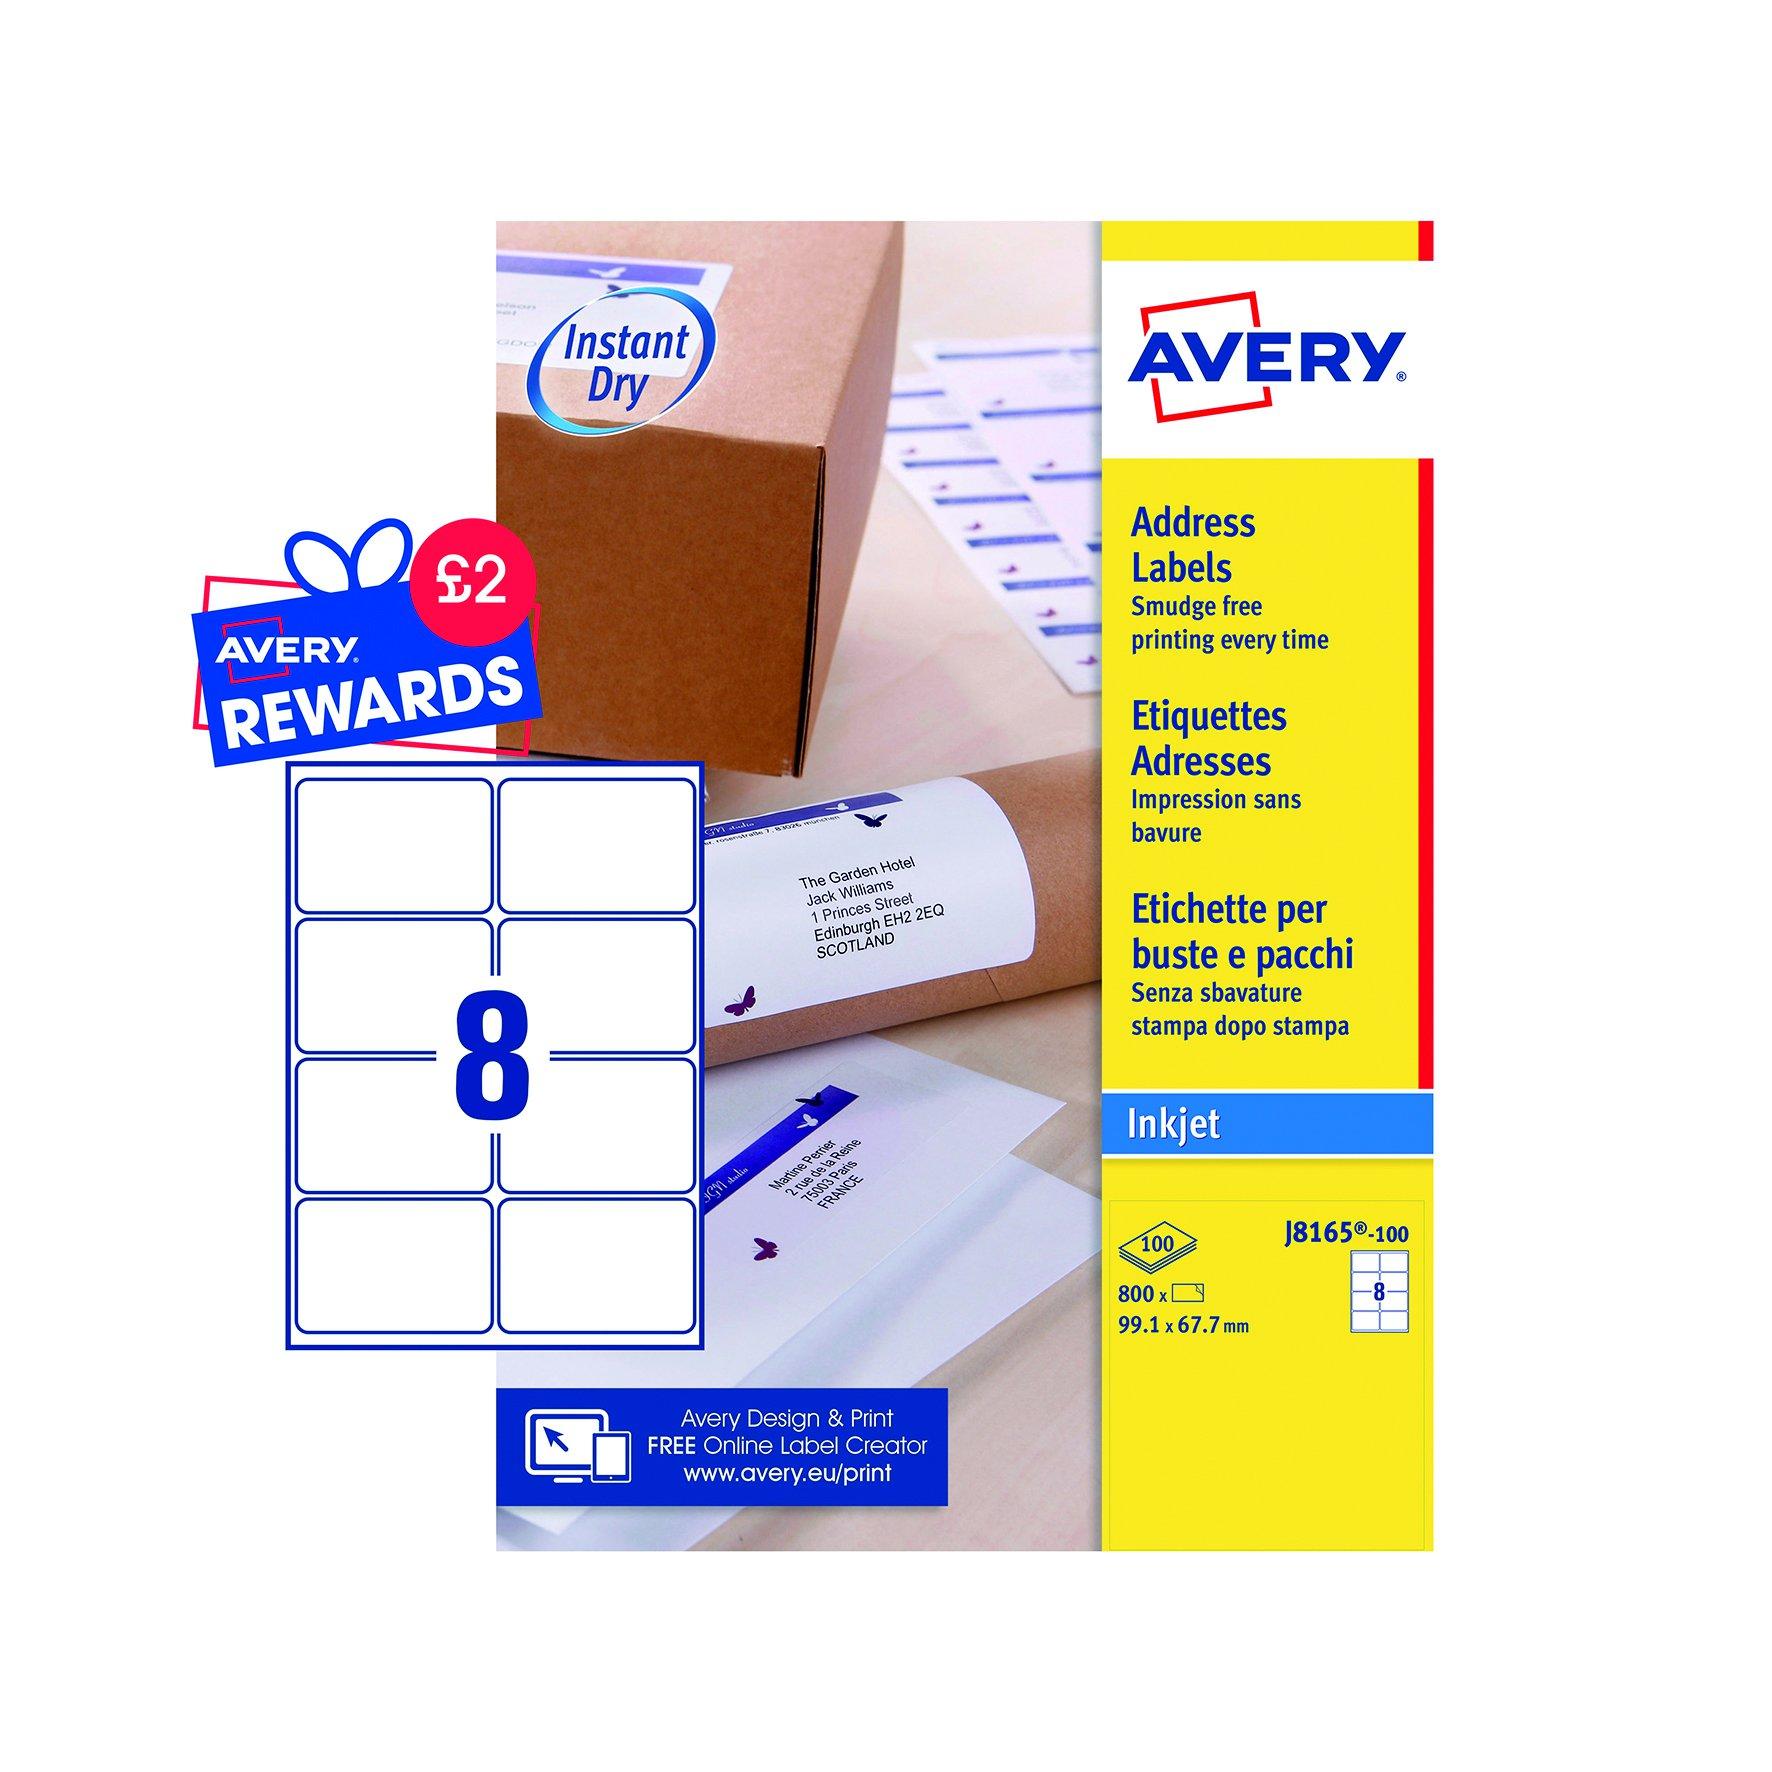 Avery QuickDRY Inkjet Labels 99.1x67.7mm White (100) J8165-100